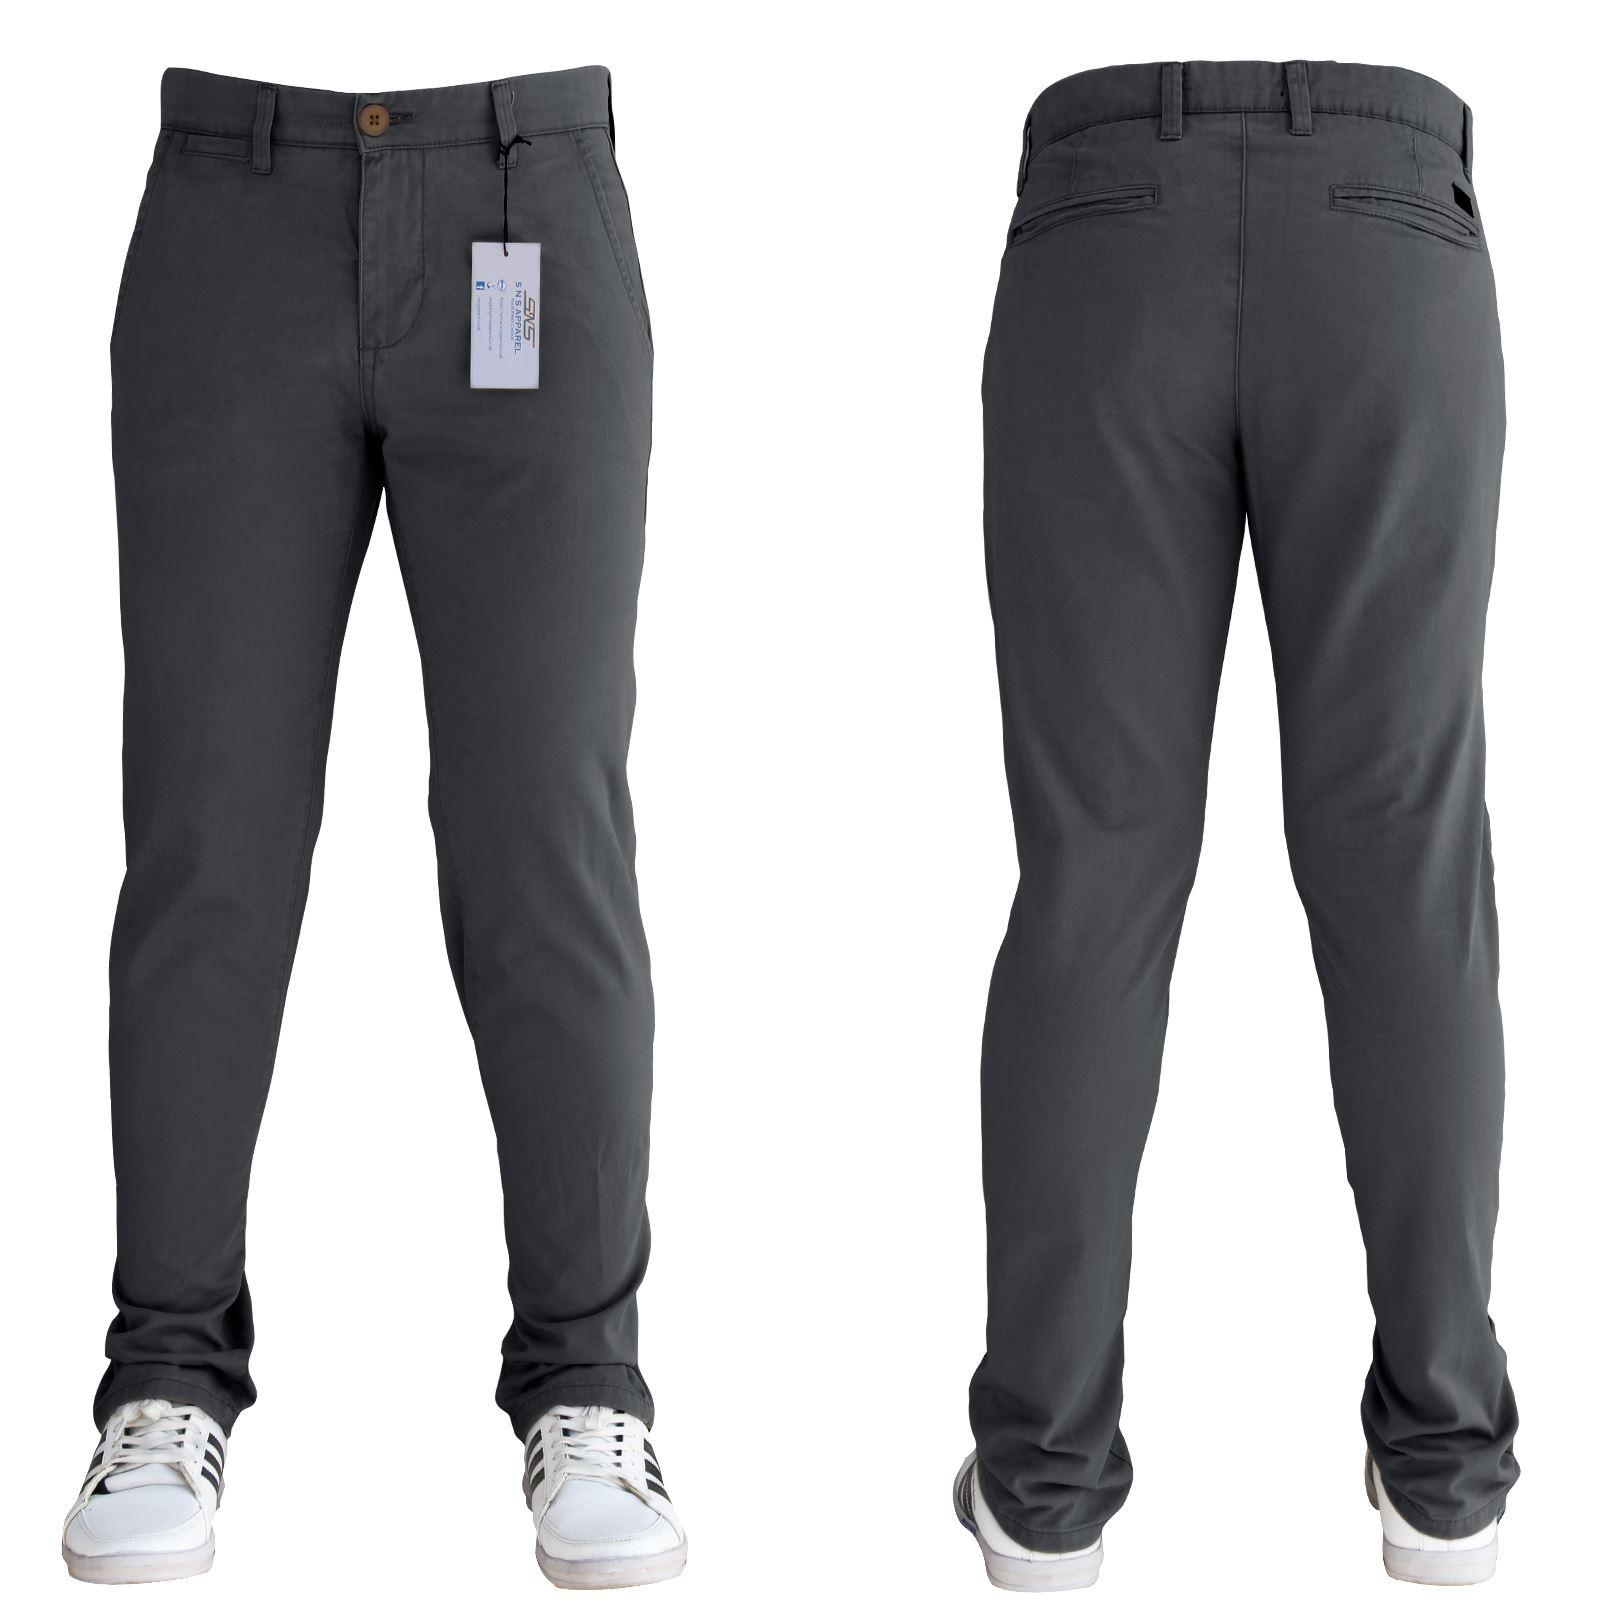 Mens Designer Regular Slim Fit Straight Trousers Cotton Chinos Jeans SNS Apparel